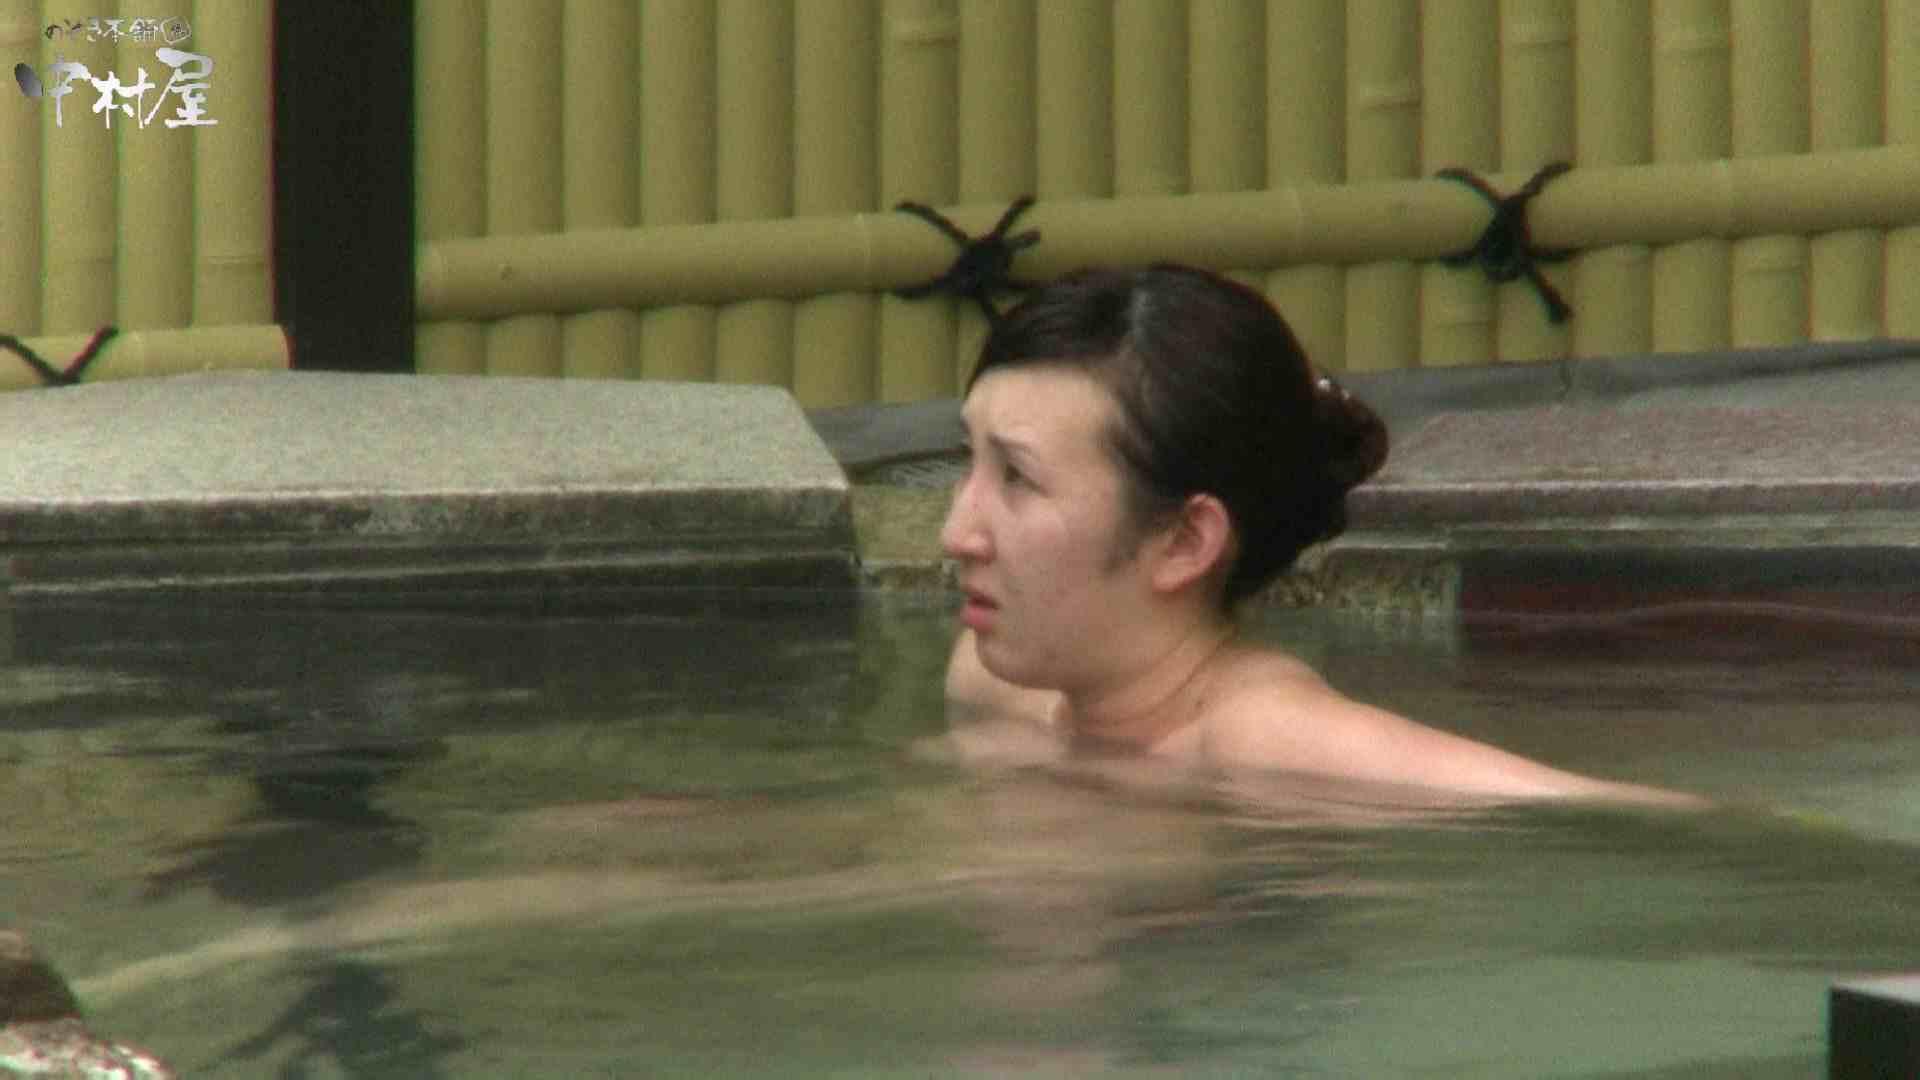 Aquaな露天風呂Vol.948 盗撮   HなOL  78pic 13